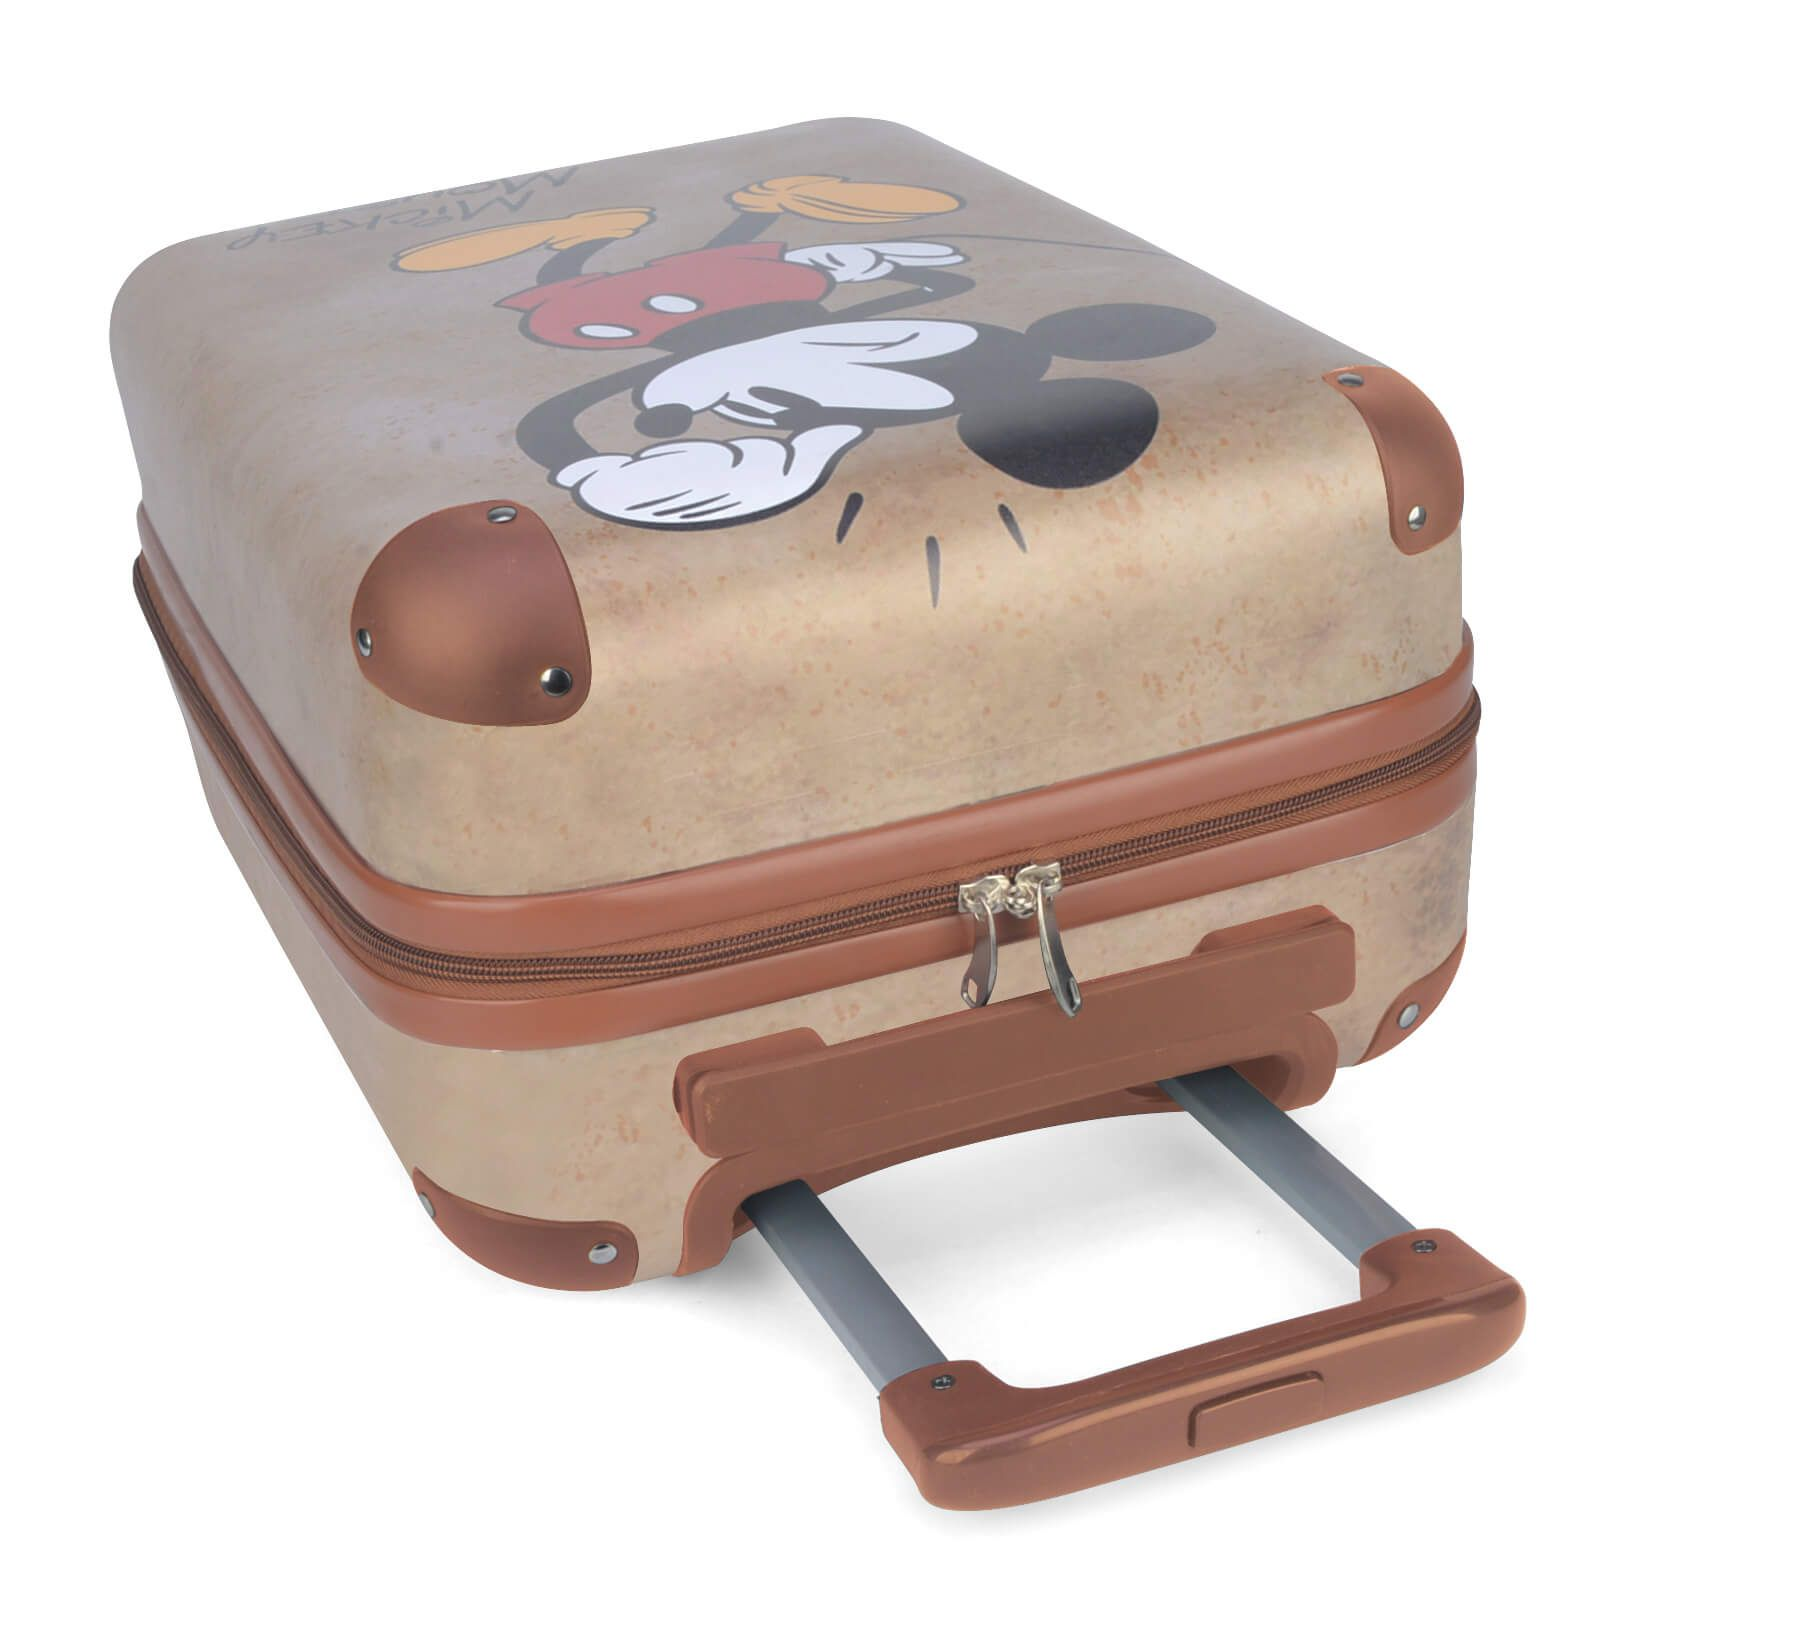 Mala De Viagem Mickey Mouse Disney Pequena P Rodas 360° Ouro